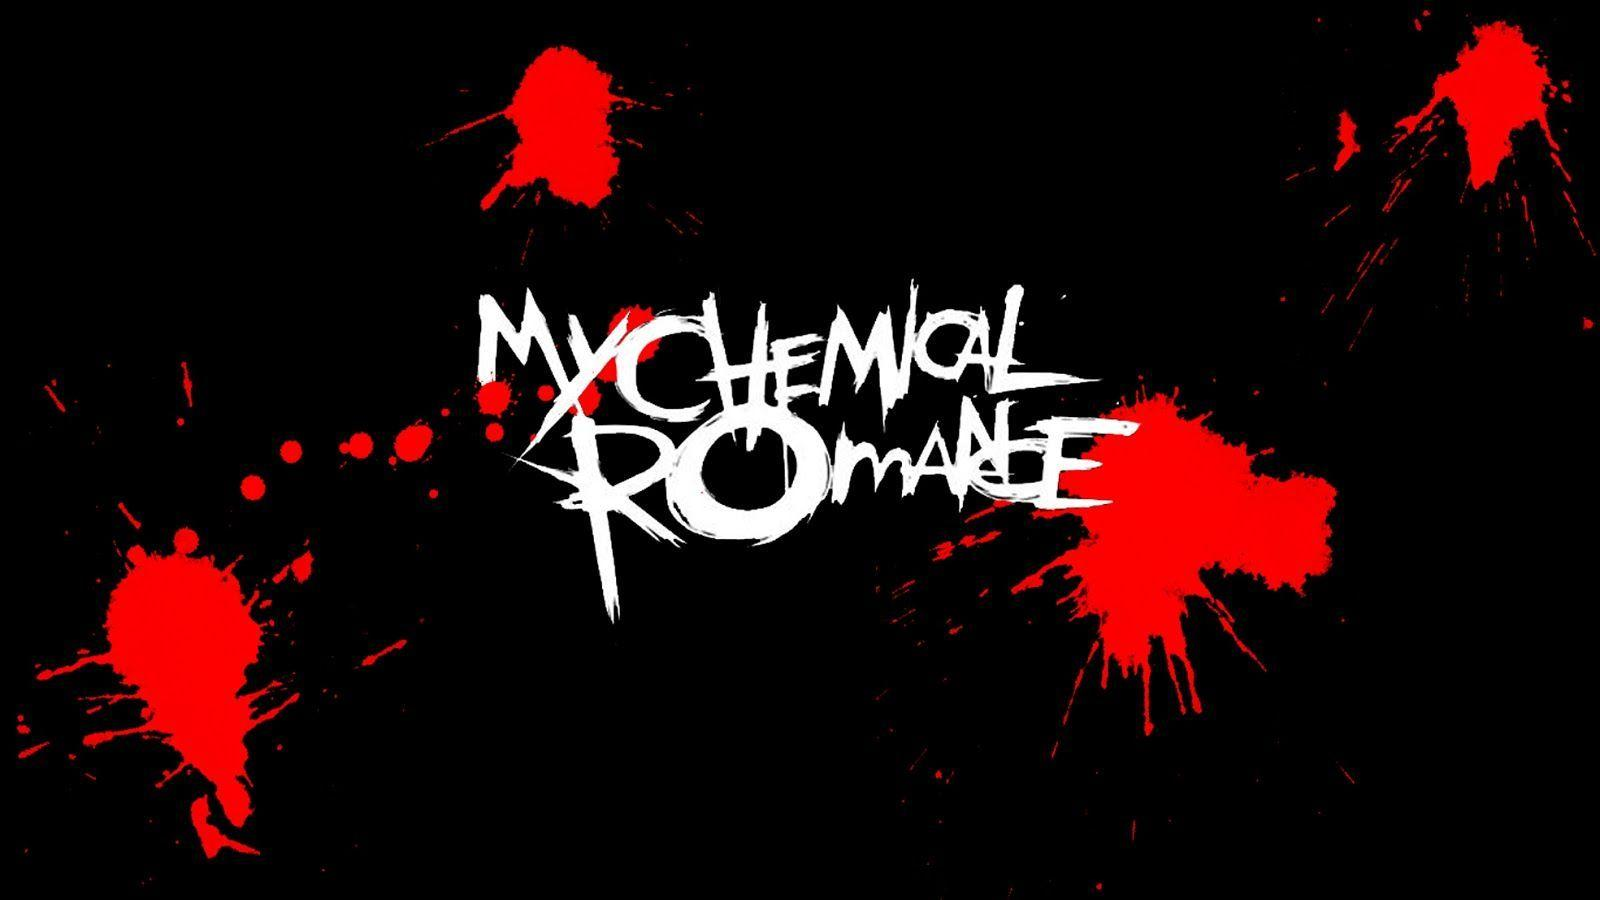 My Chemical Romance Iphone Wallpaper 69530